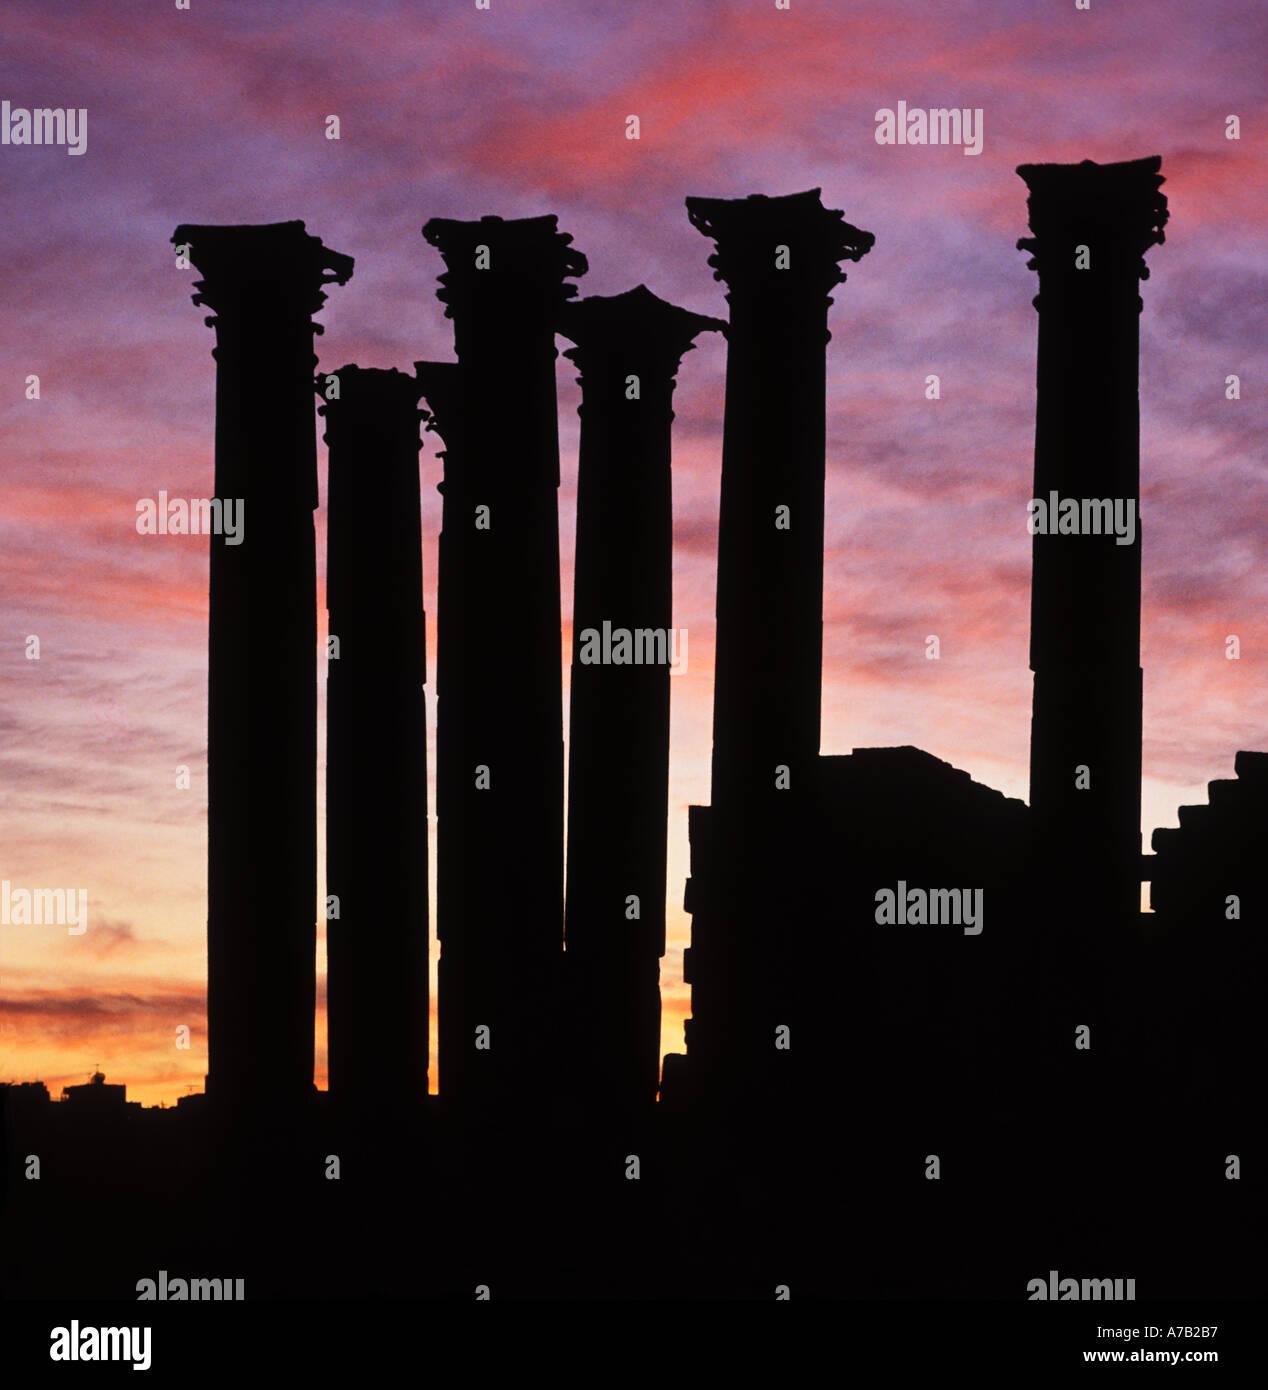 Temple of Artemis country Jerash Jordan at sunset - Stock Image